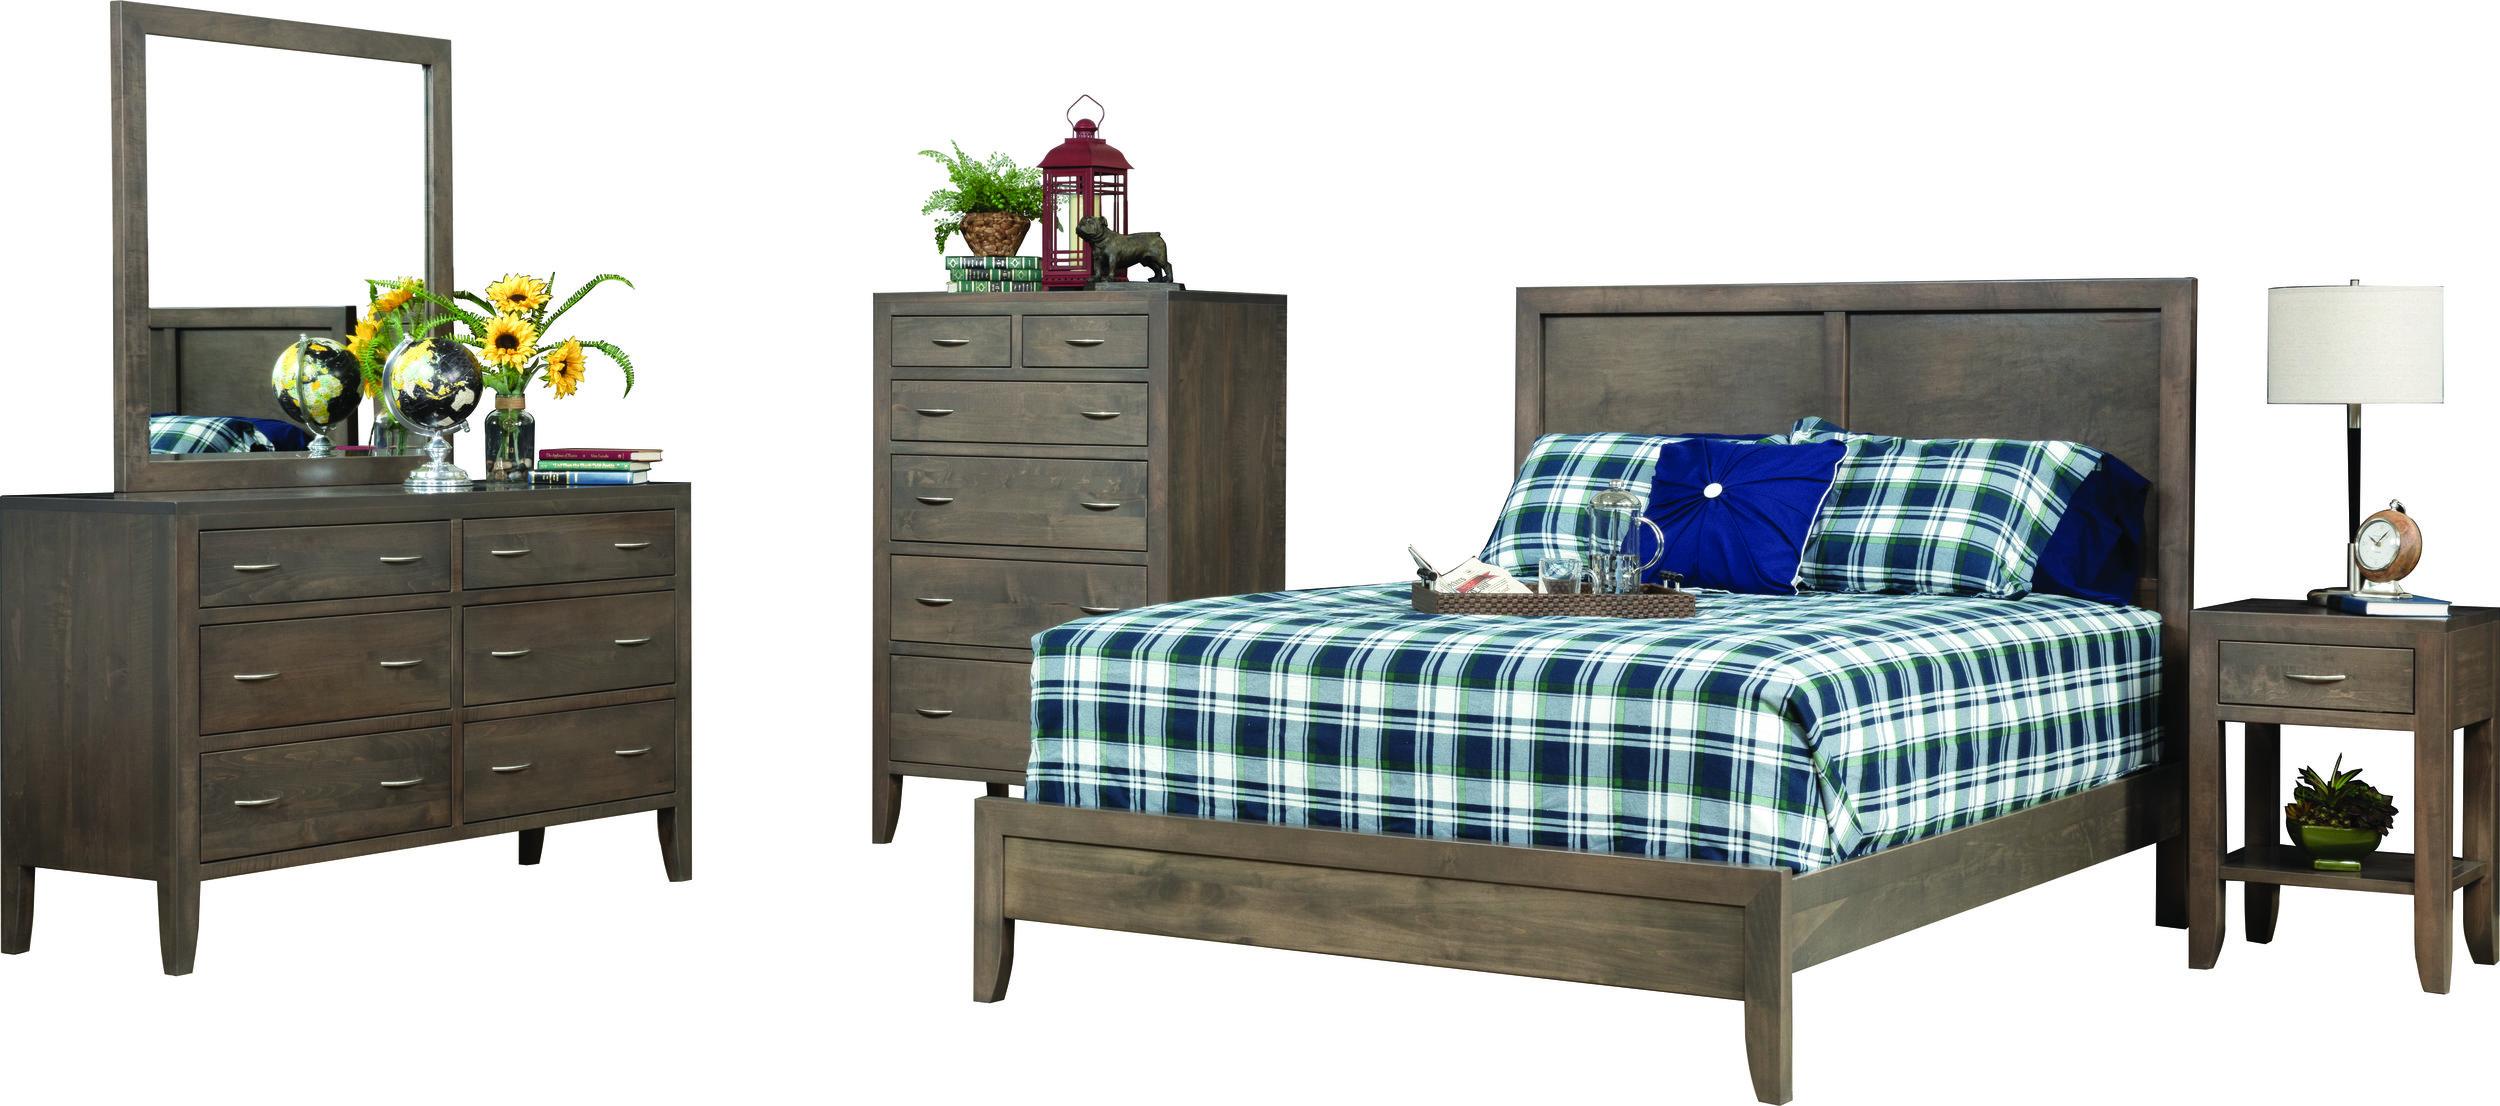 Barrington_Bedroom_Collection-Standard.jpg